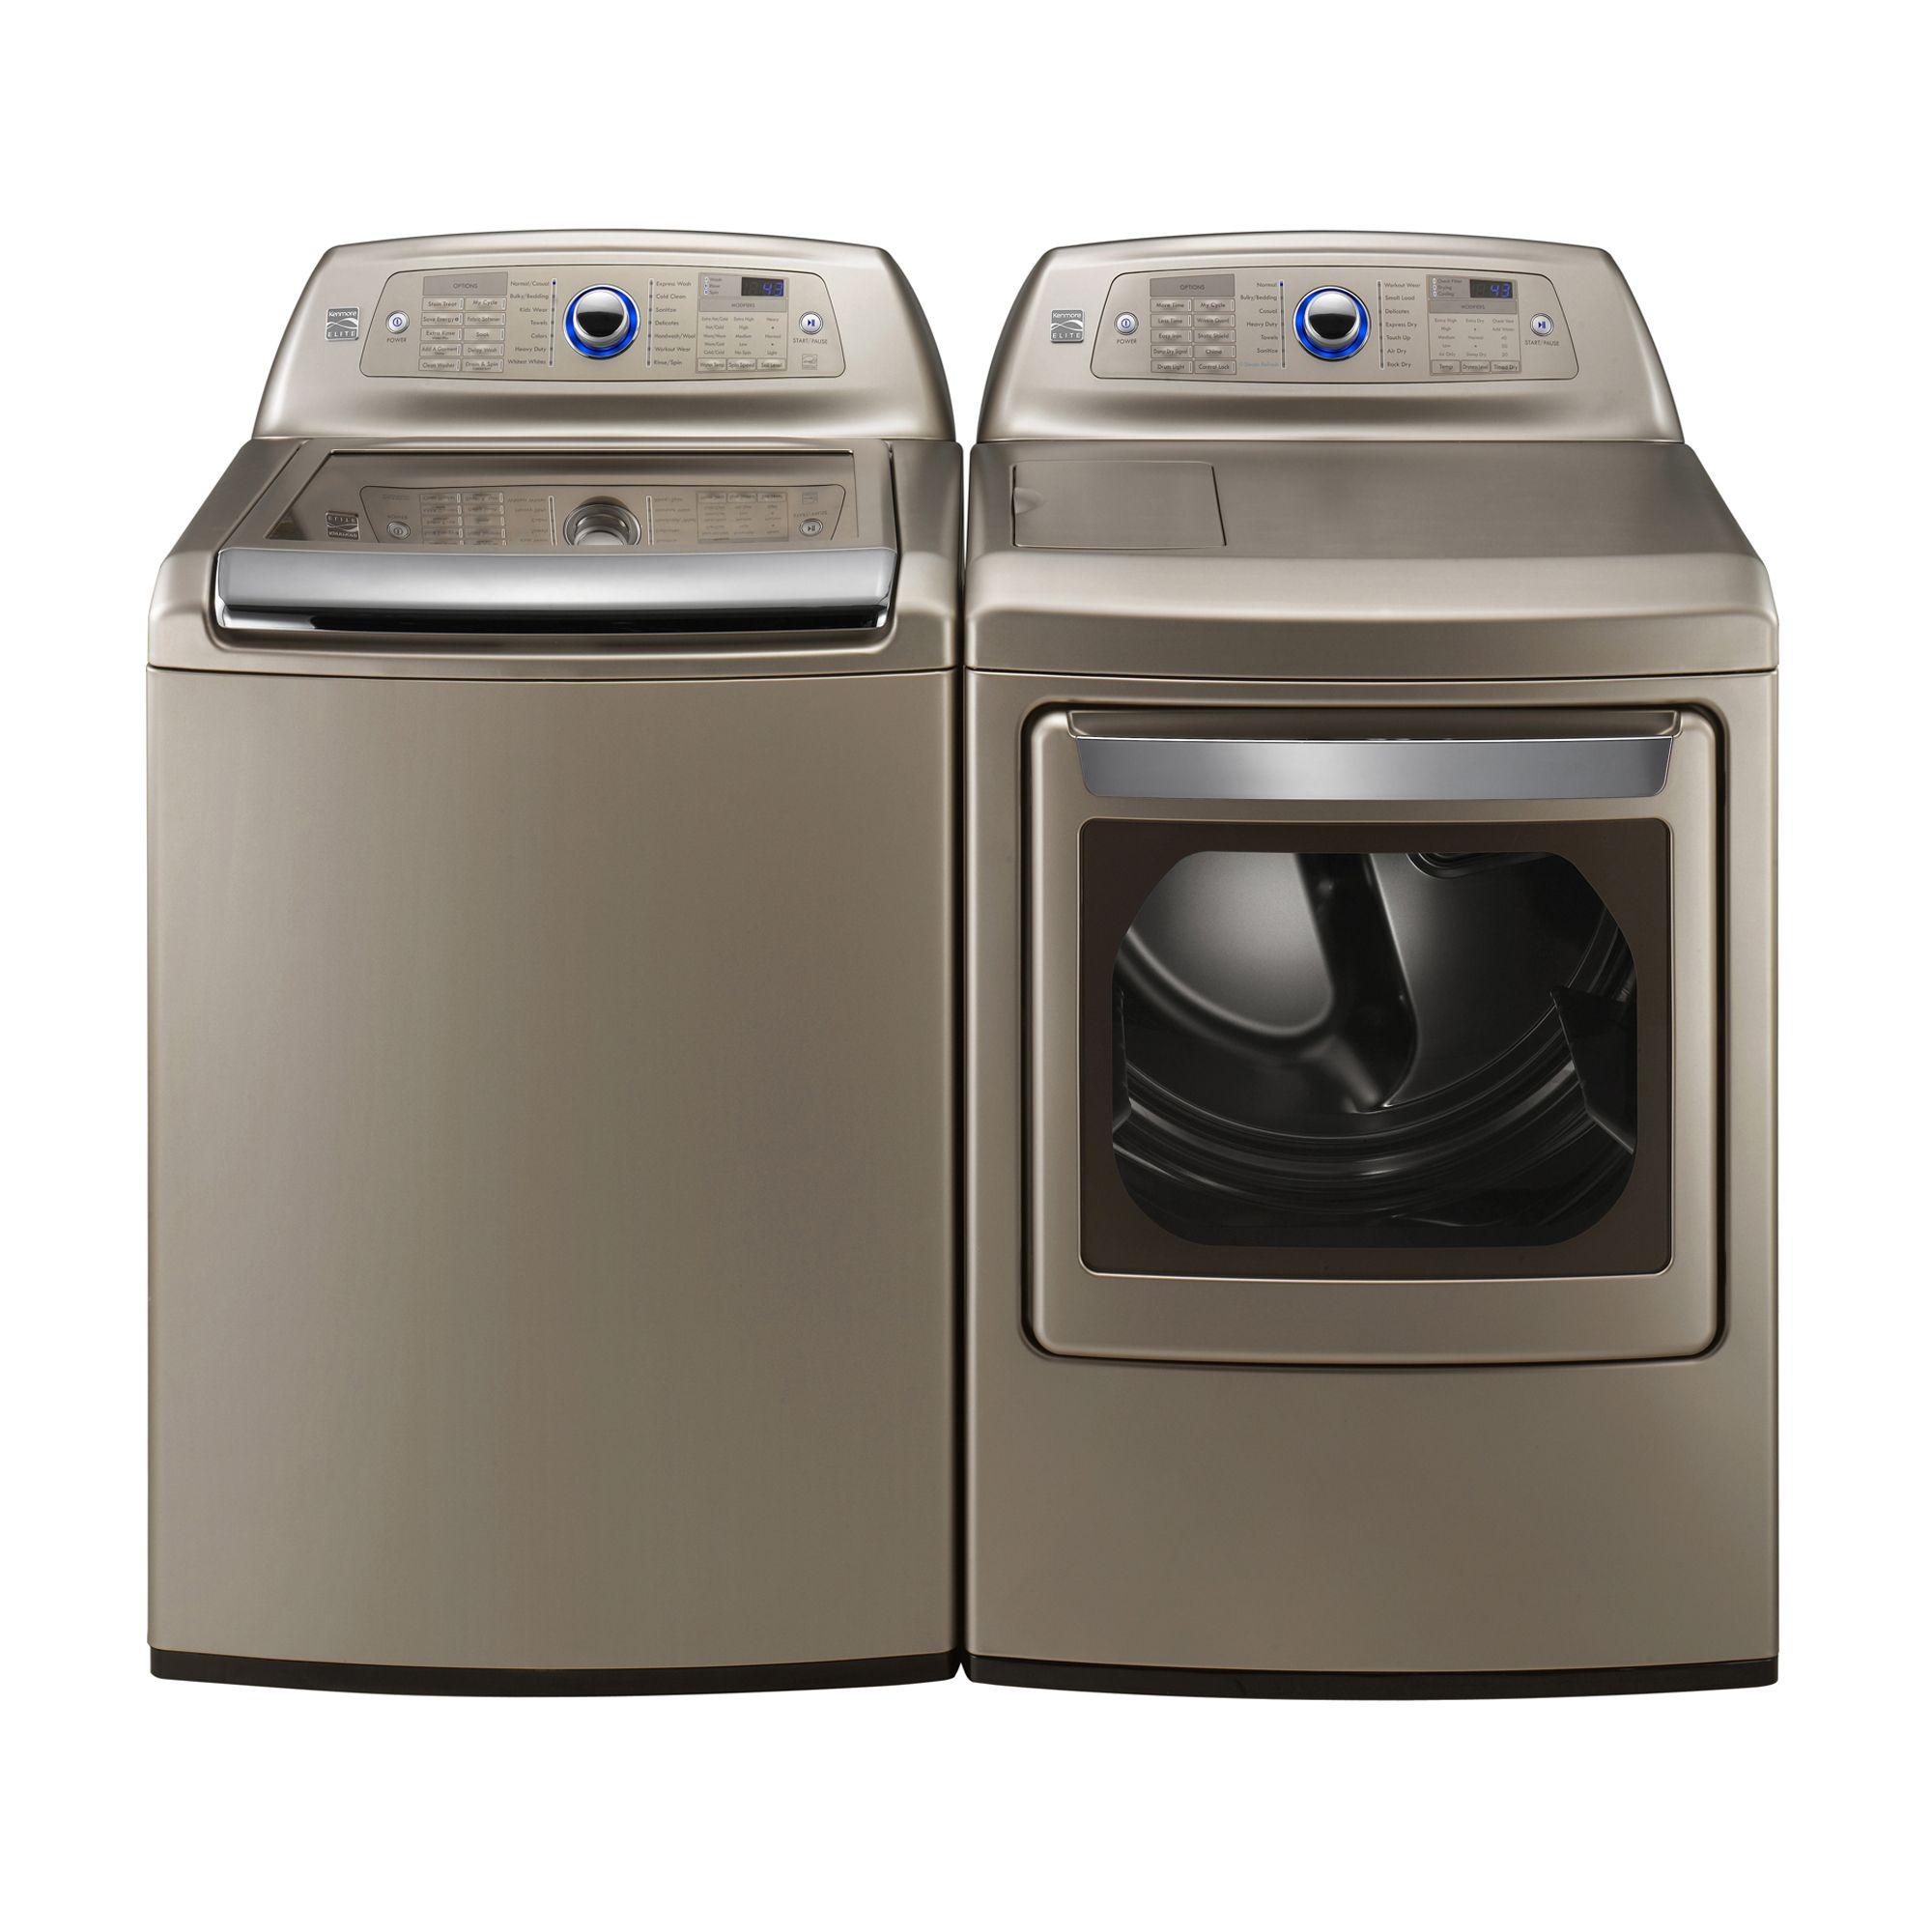 Kenmore Elite 4.5 cubic foot Top-Load High-Efficiency Washing Machine